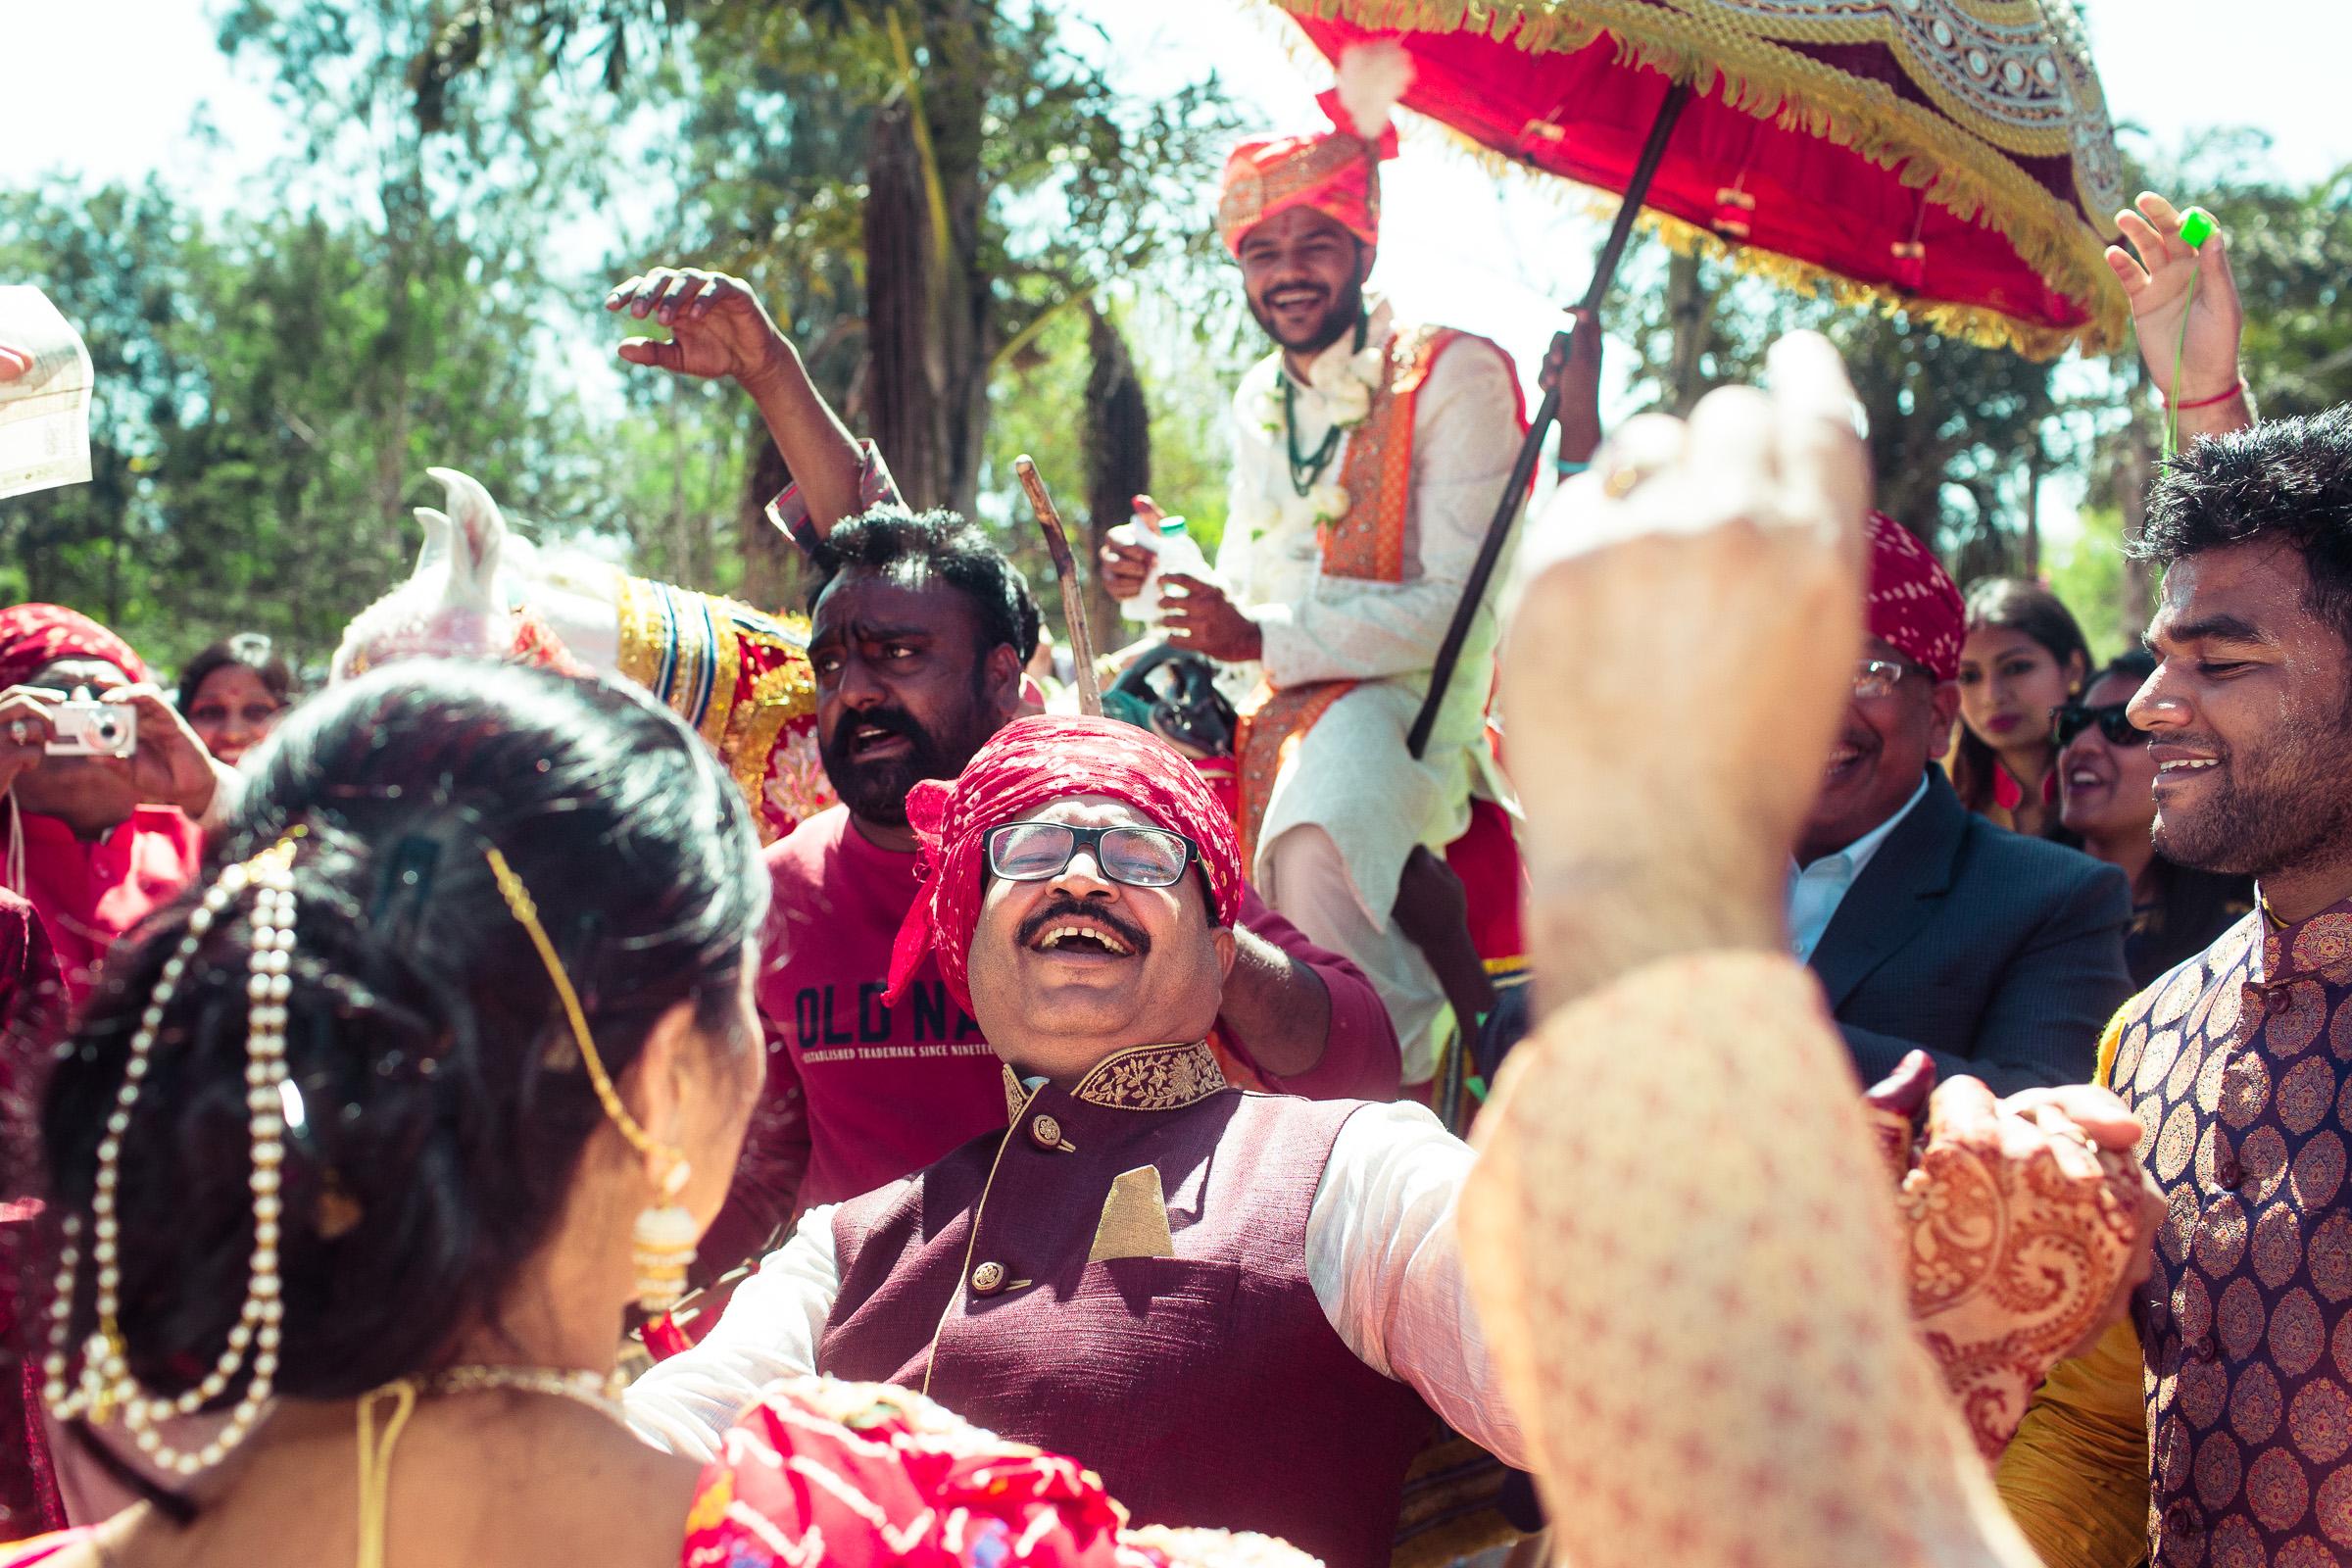 marwari-candid-wedding-photographers-bangalore-0019.jpg